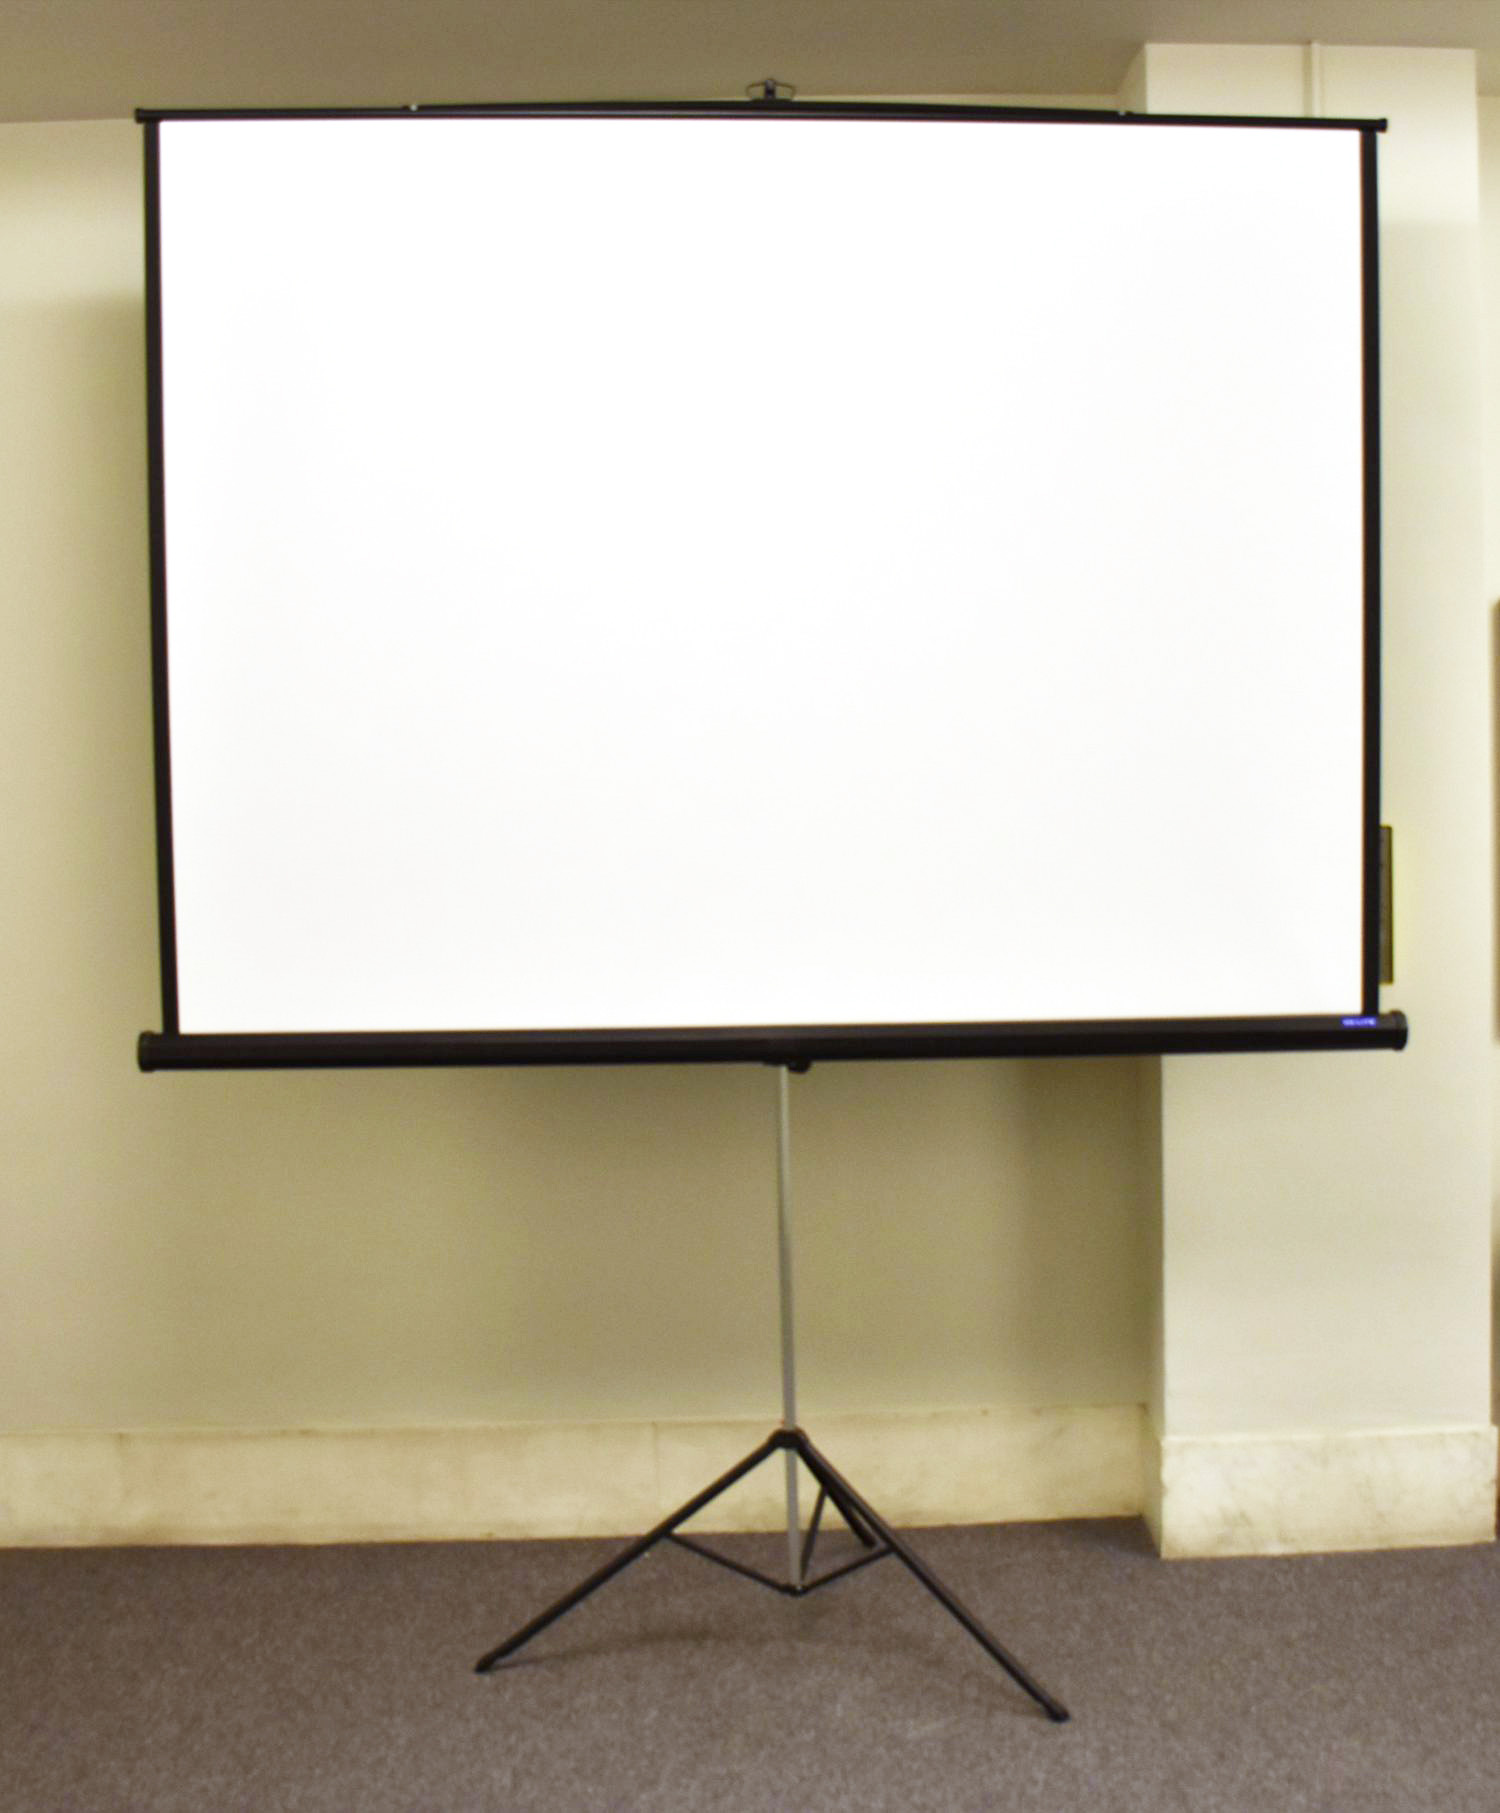 7-foot Screen